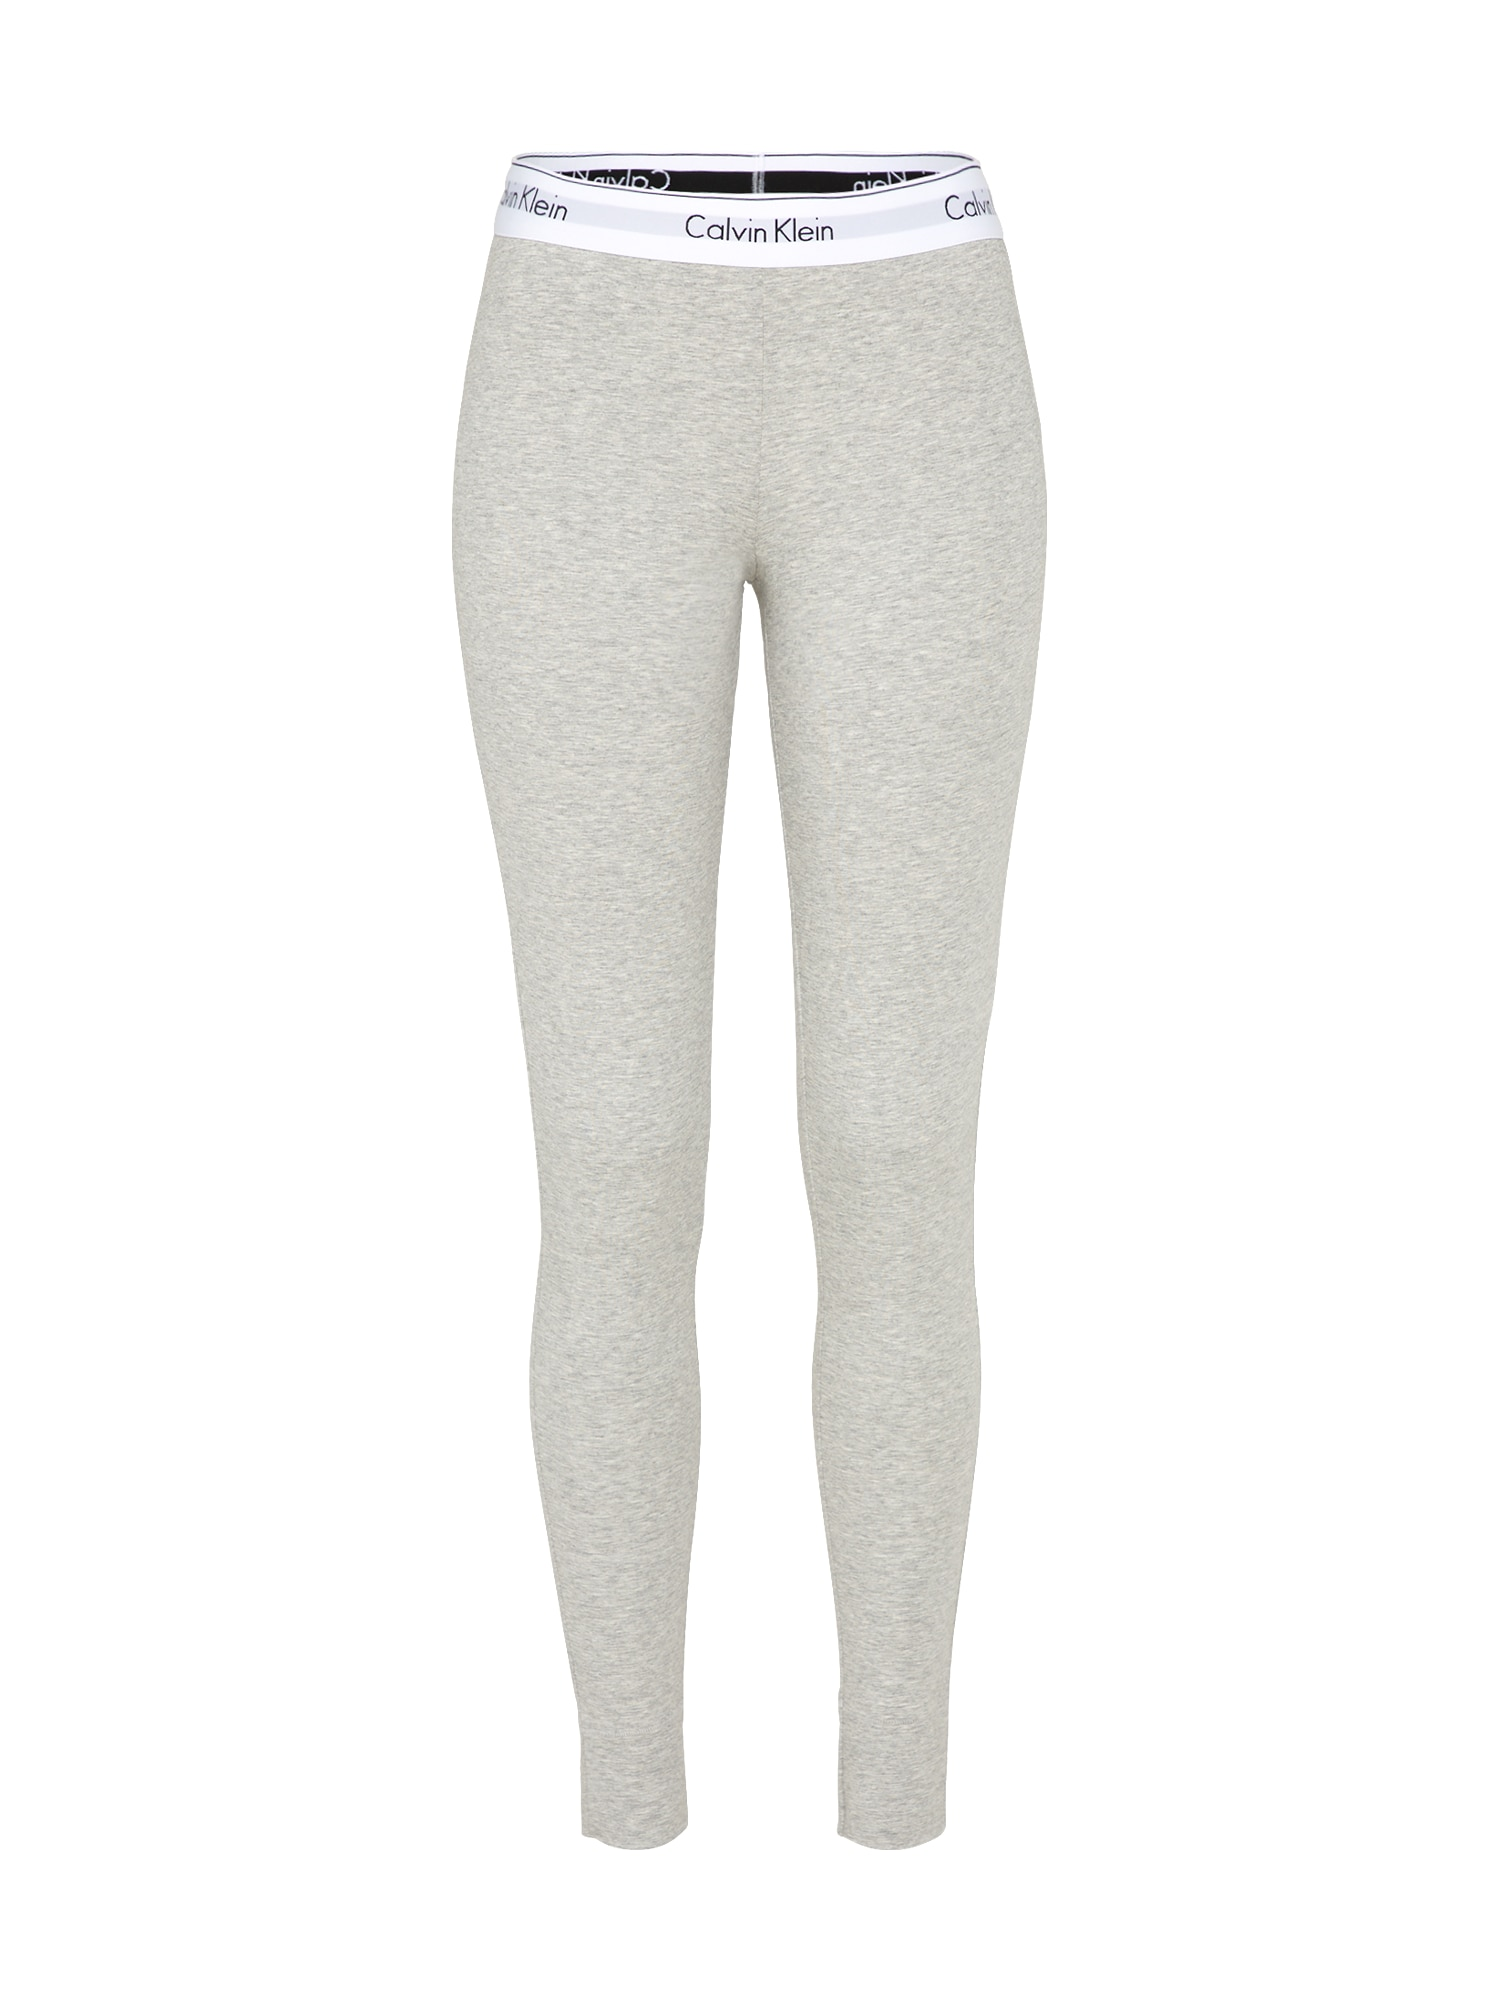 Calvin Klein Underwear Pižaminės kelnės margai pilka